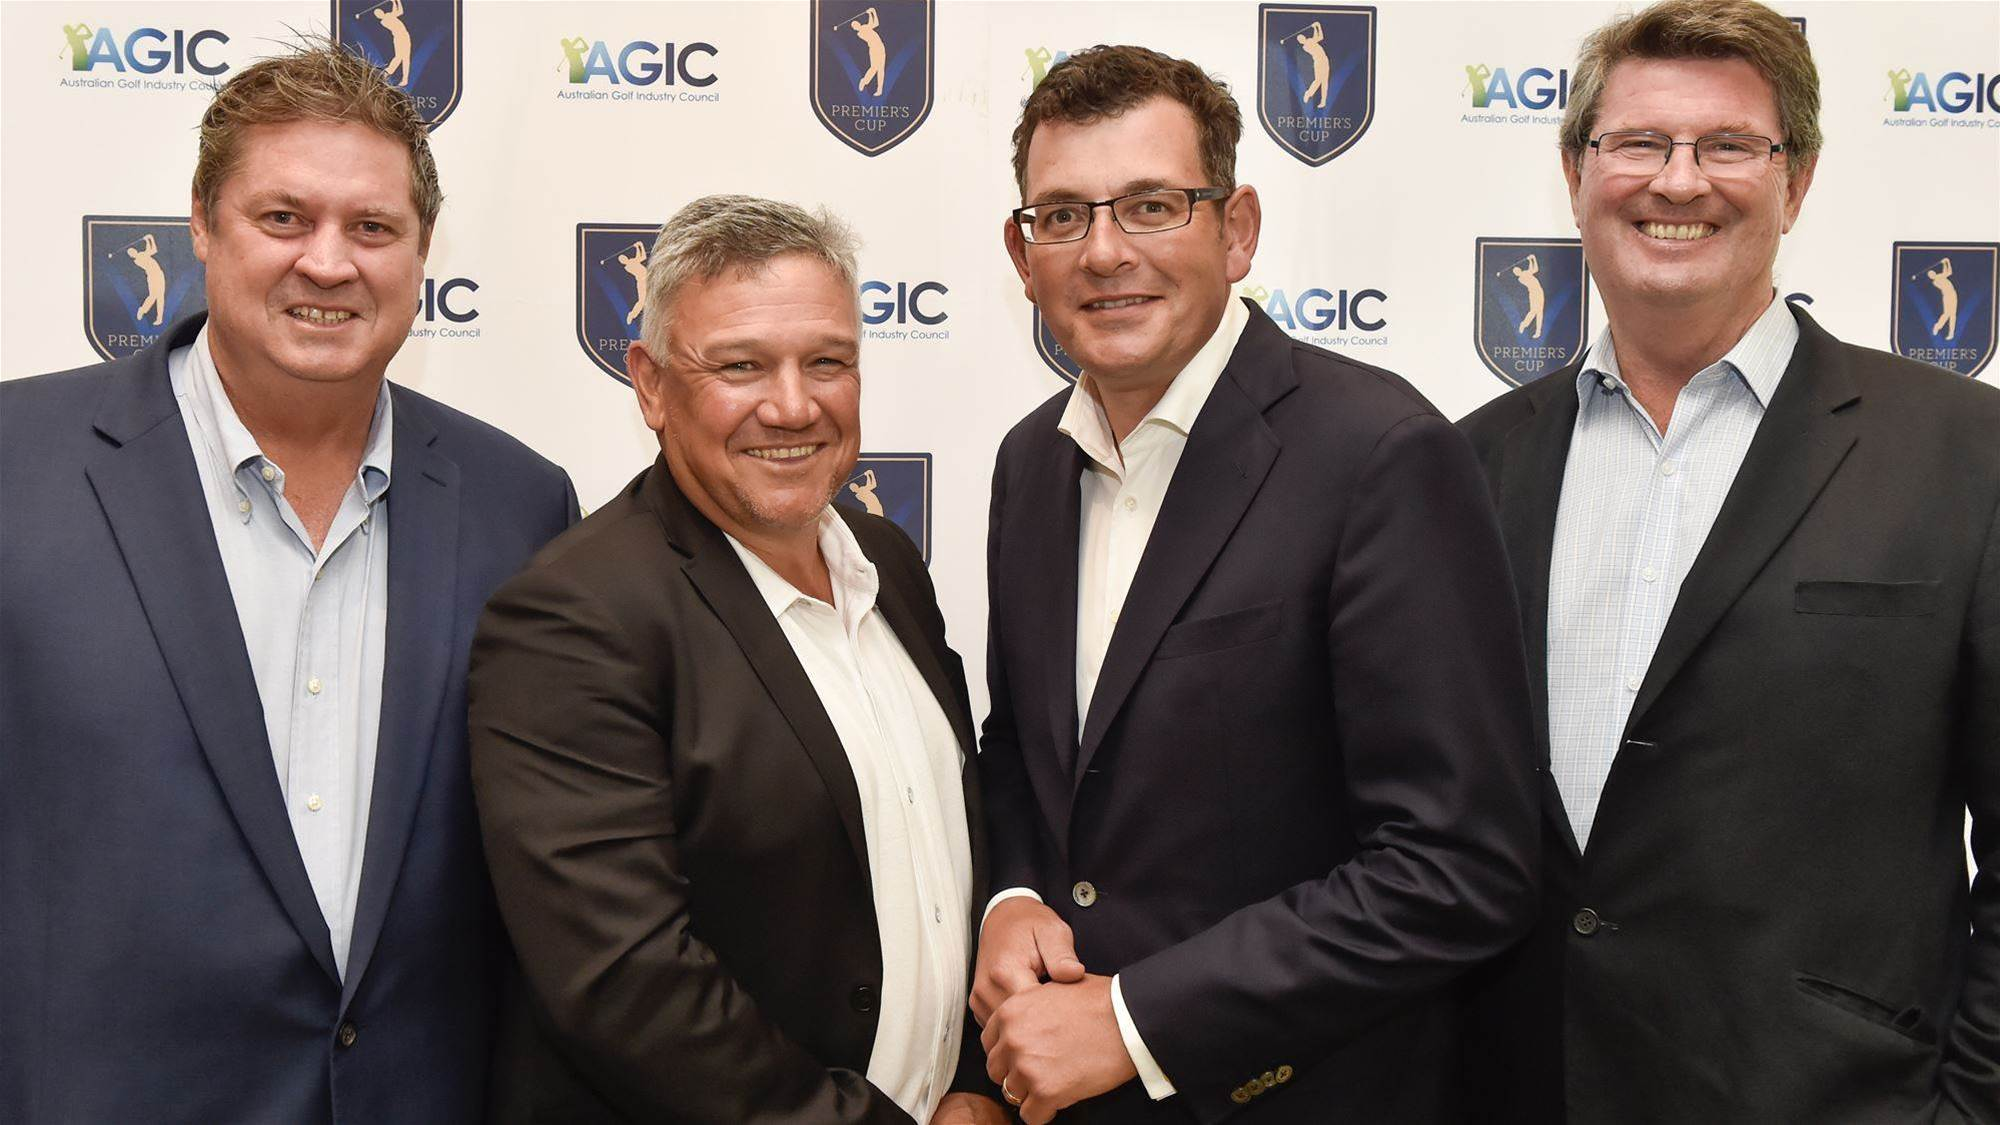 Premier's Cup raises $245K for hospital charity